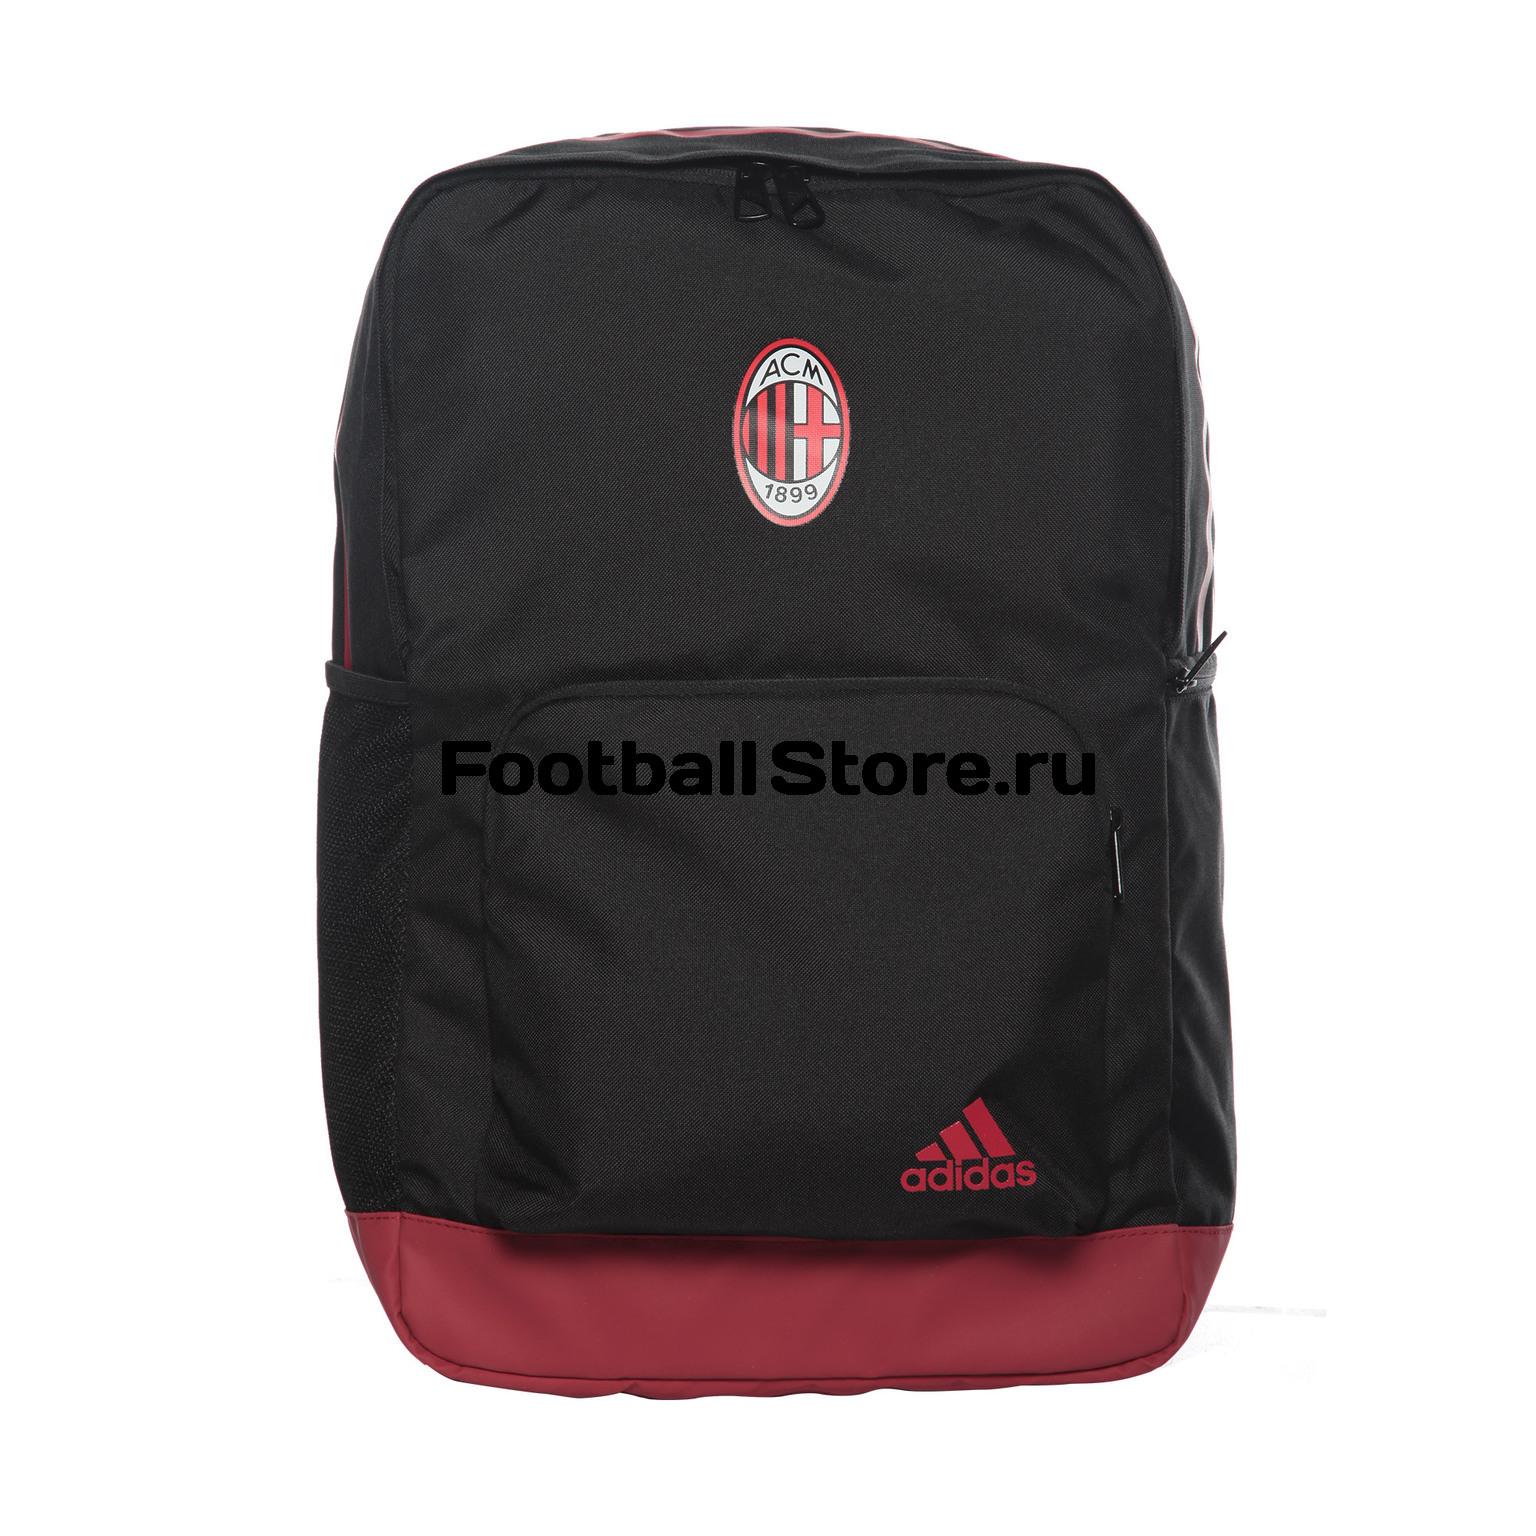 Сумки/Рюкзаки Adidas Рюкзак Adidas Milan BackPack BR7080 adidas ac milan гетры